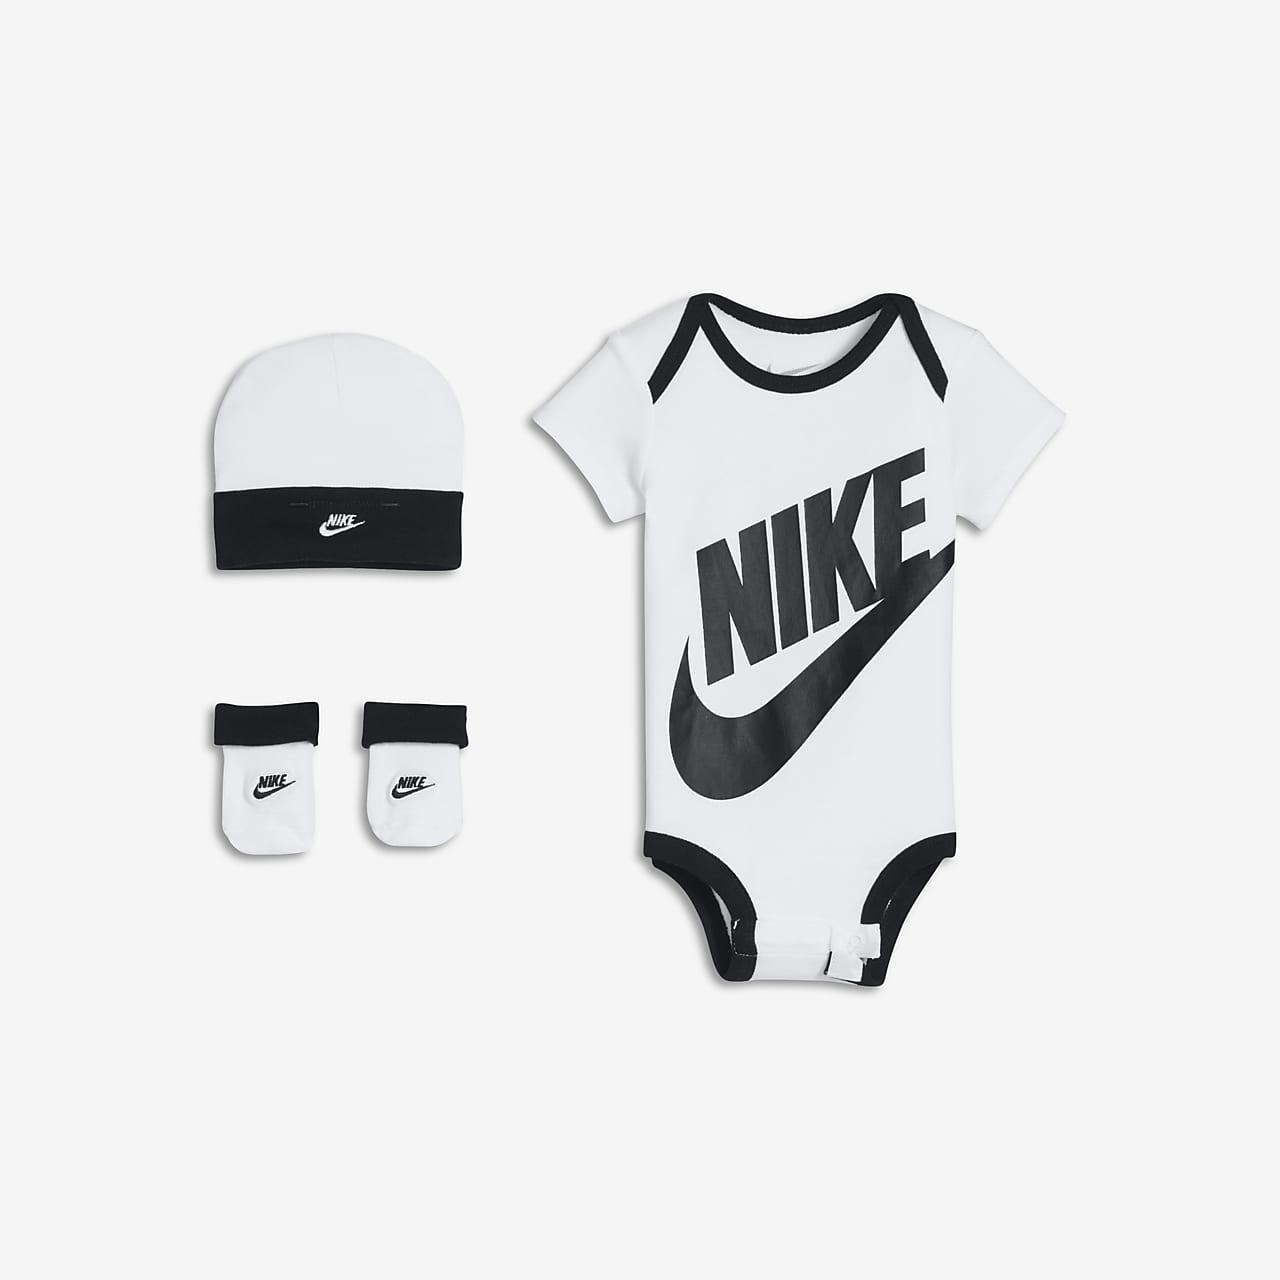 Completo in 3 pezzi Nike - Neonati (0-6 mesi)